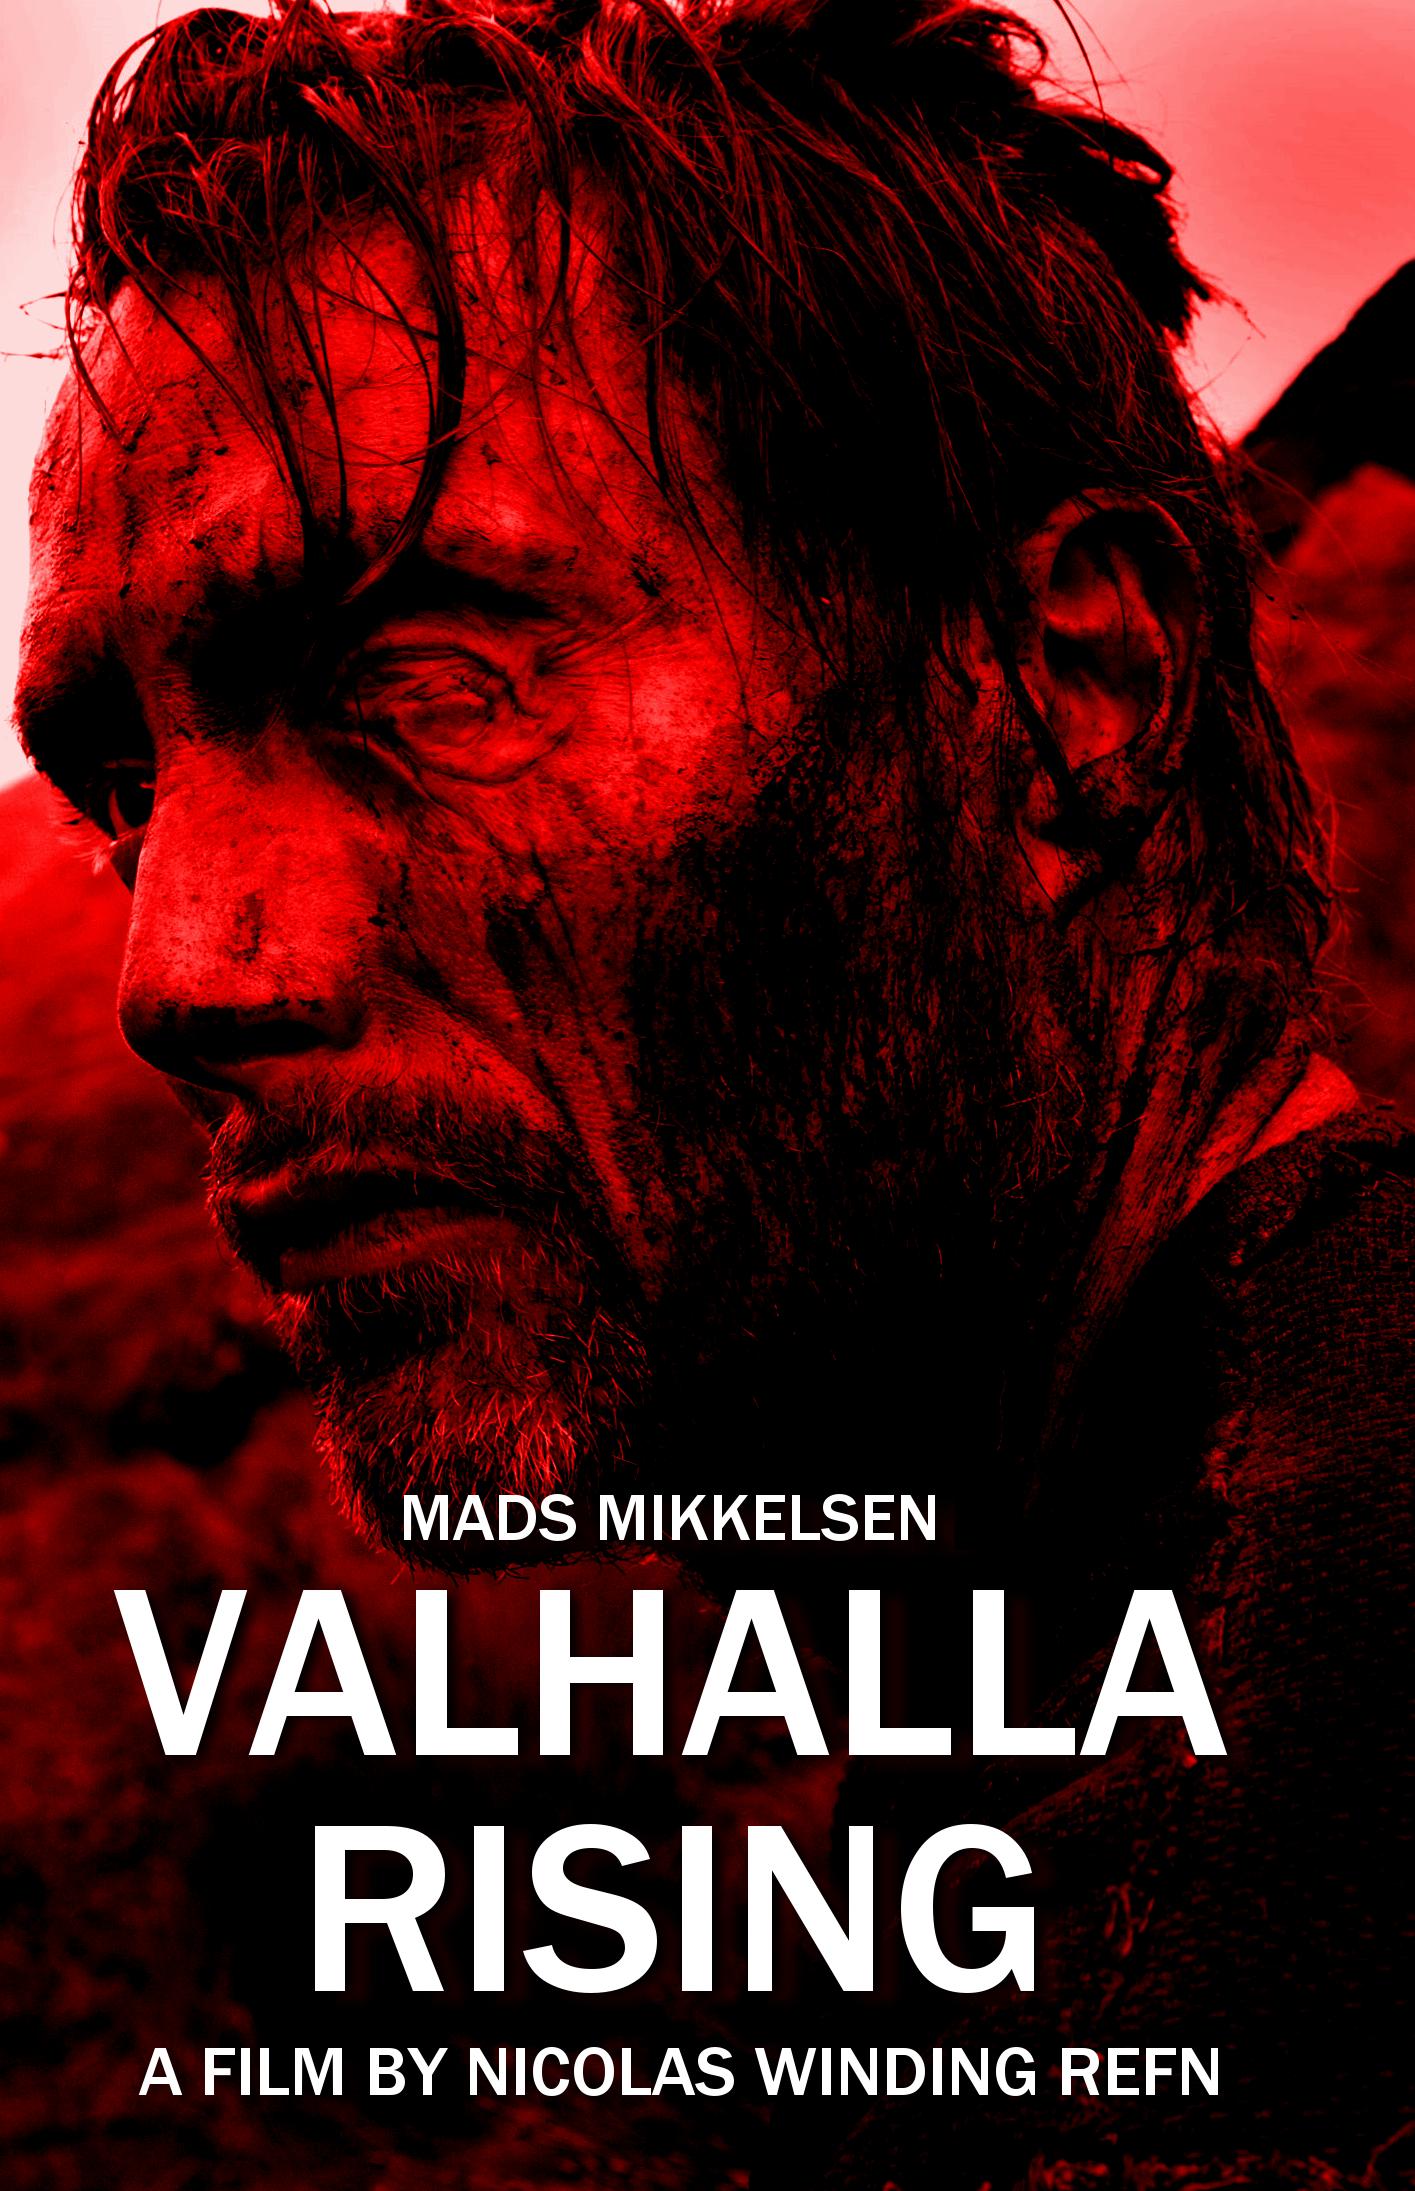 Valhalla Rising 2009 Hd Wallpaper From Gallsourcecom